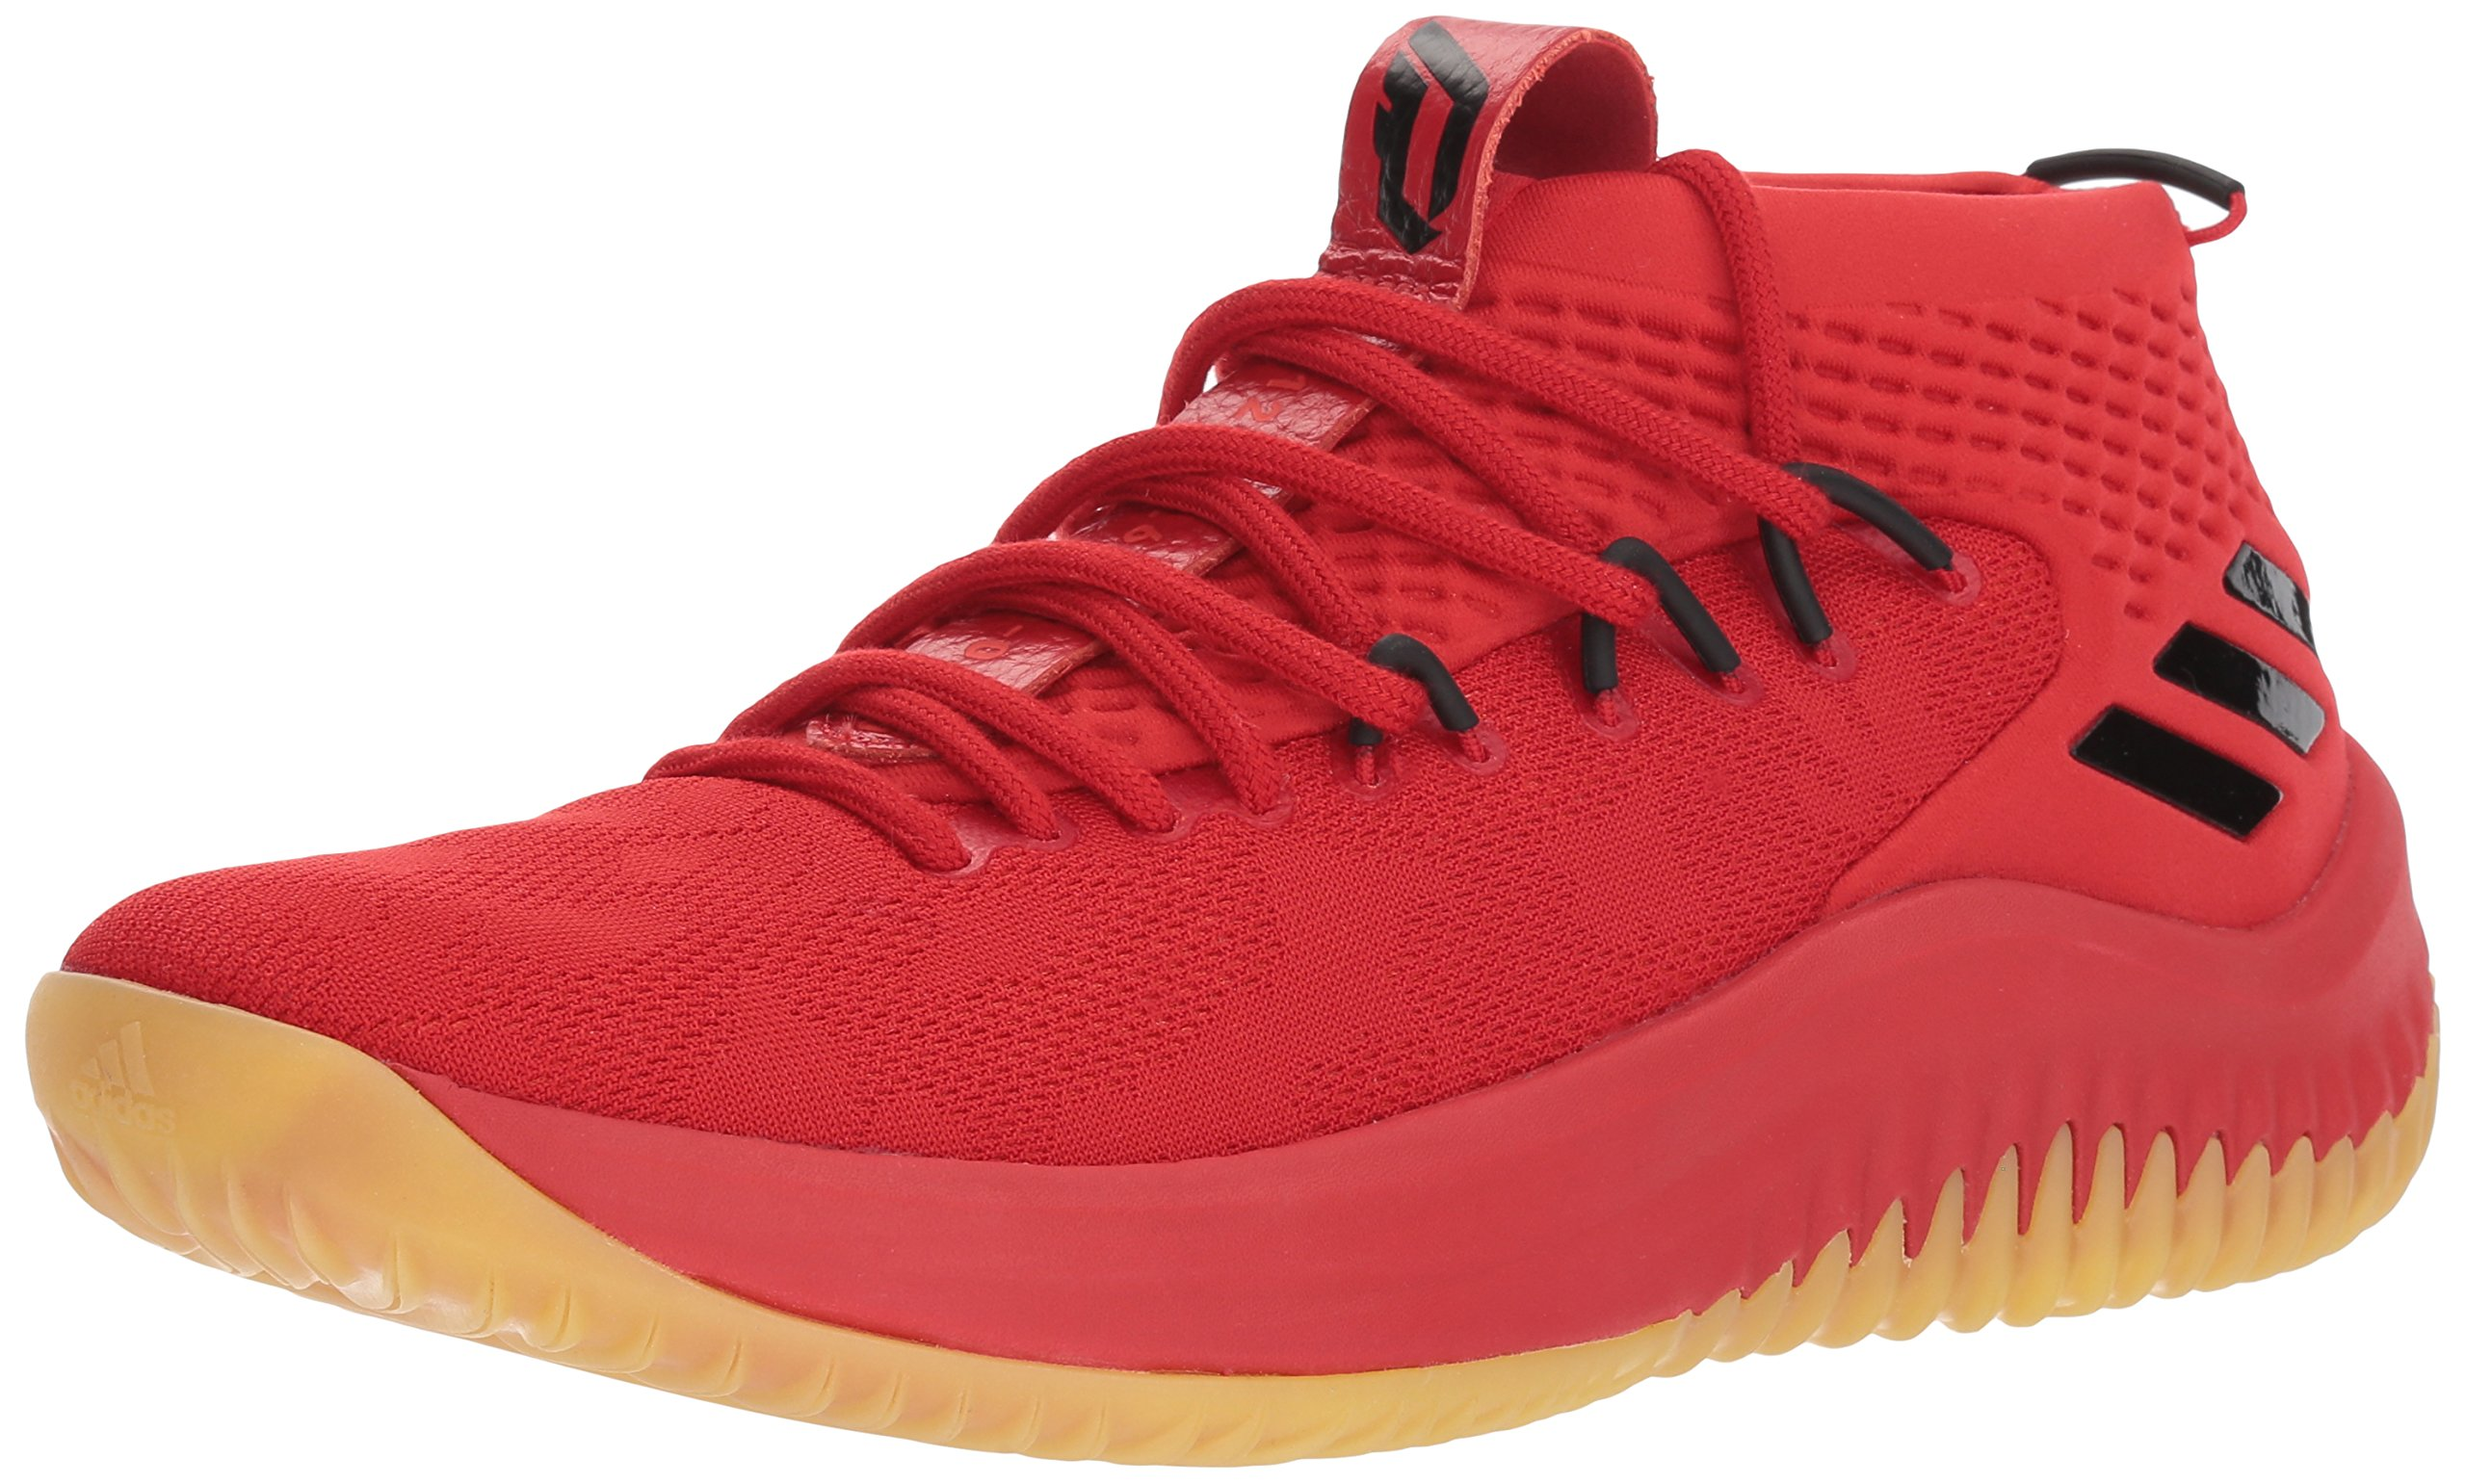 adidas Performance Dame 4 Shoe Men's Basketball, Scarlet/Hi-res Red/Core Black, 12 M US